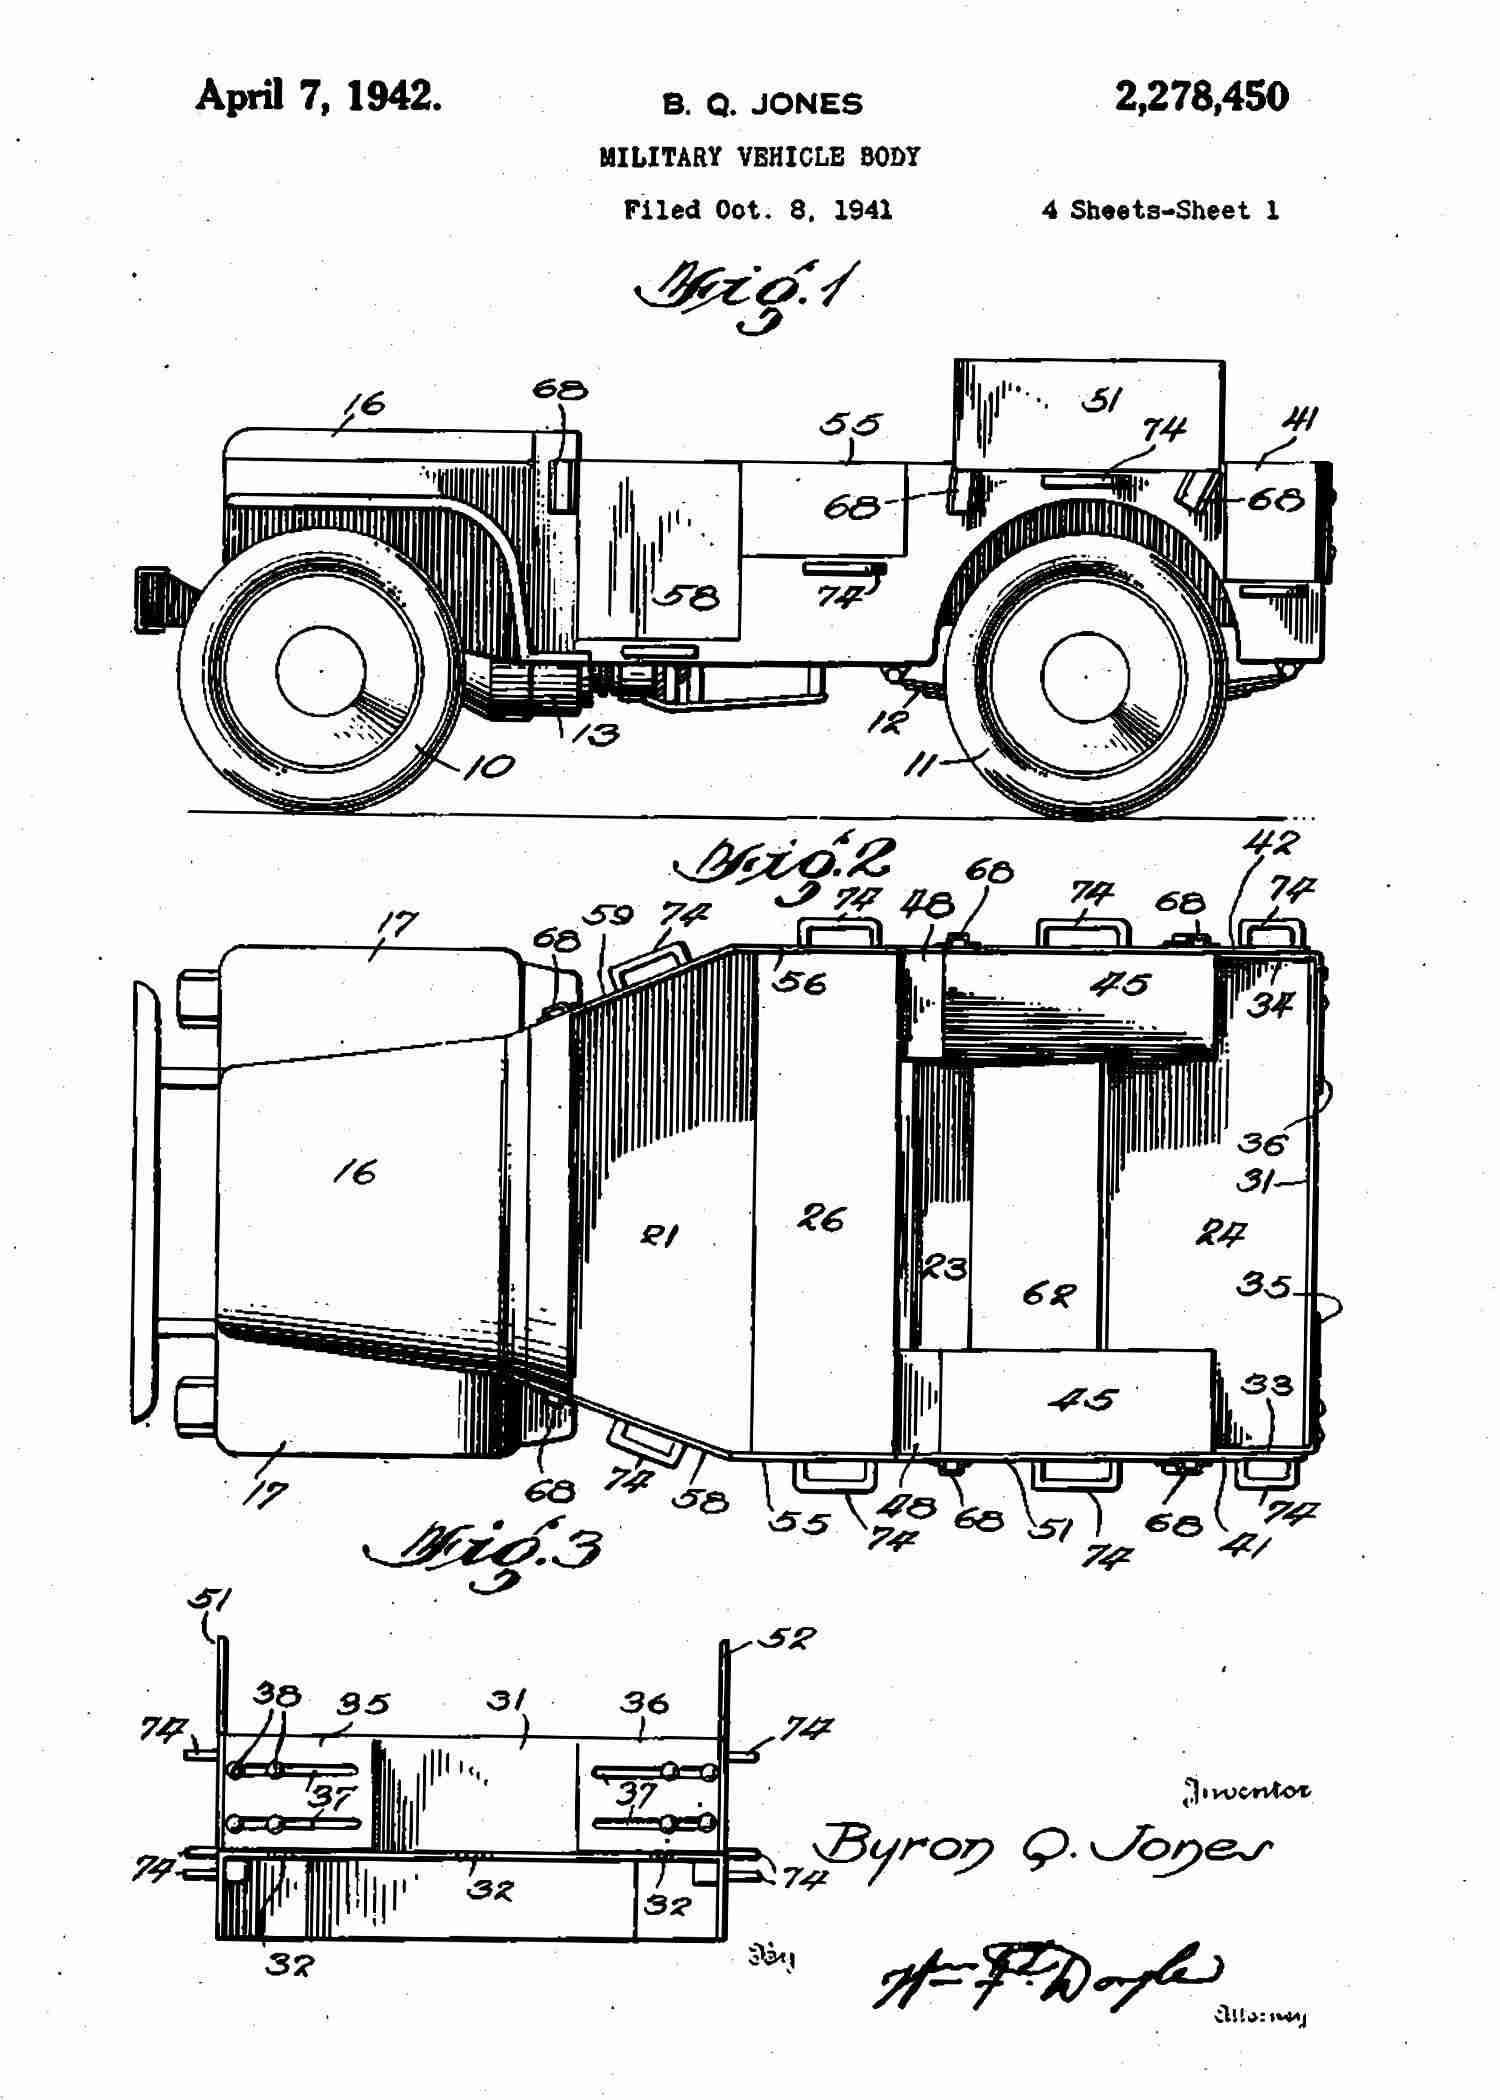 Retro Military Willys M38 Jeep